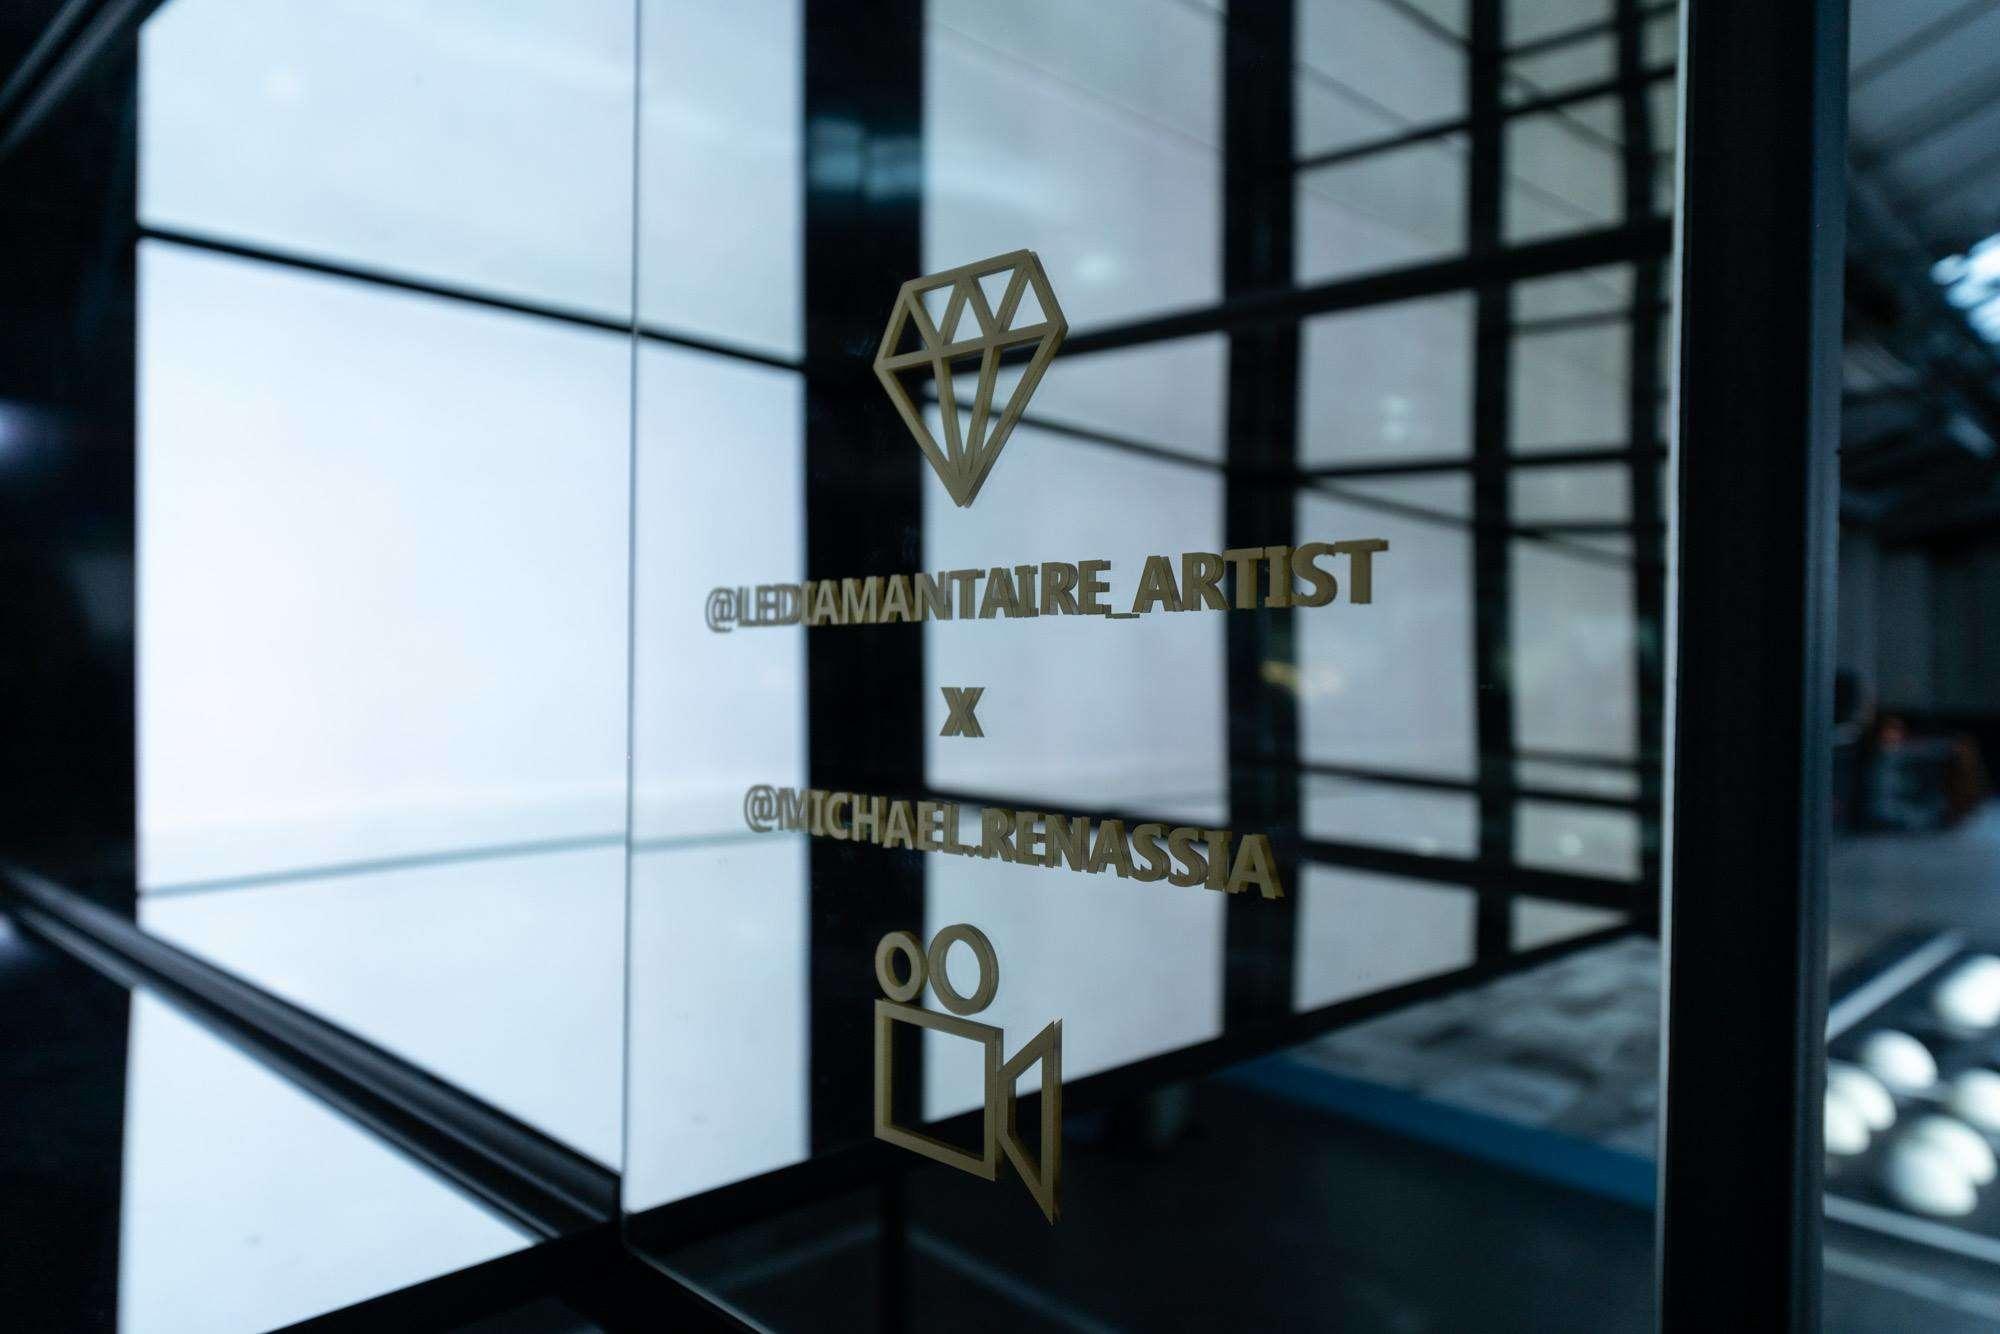 sato-creative-studio-paris-michael-renassia-le-diamantaire-trajectoire-studio-installation-video